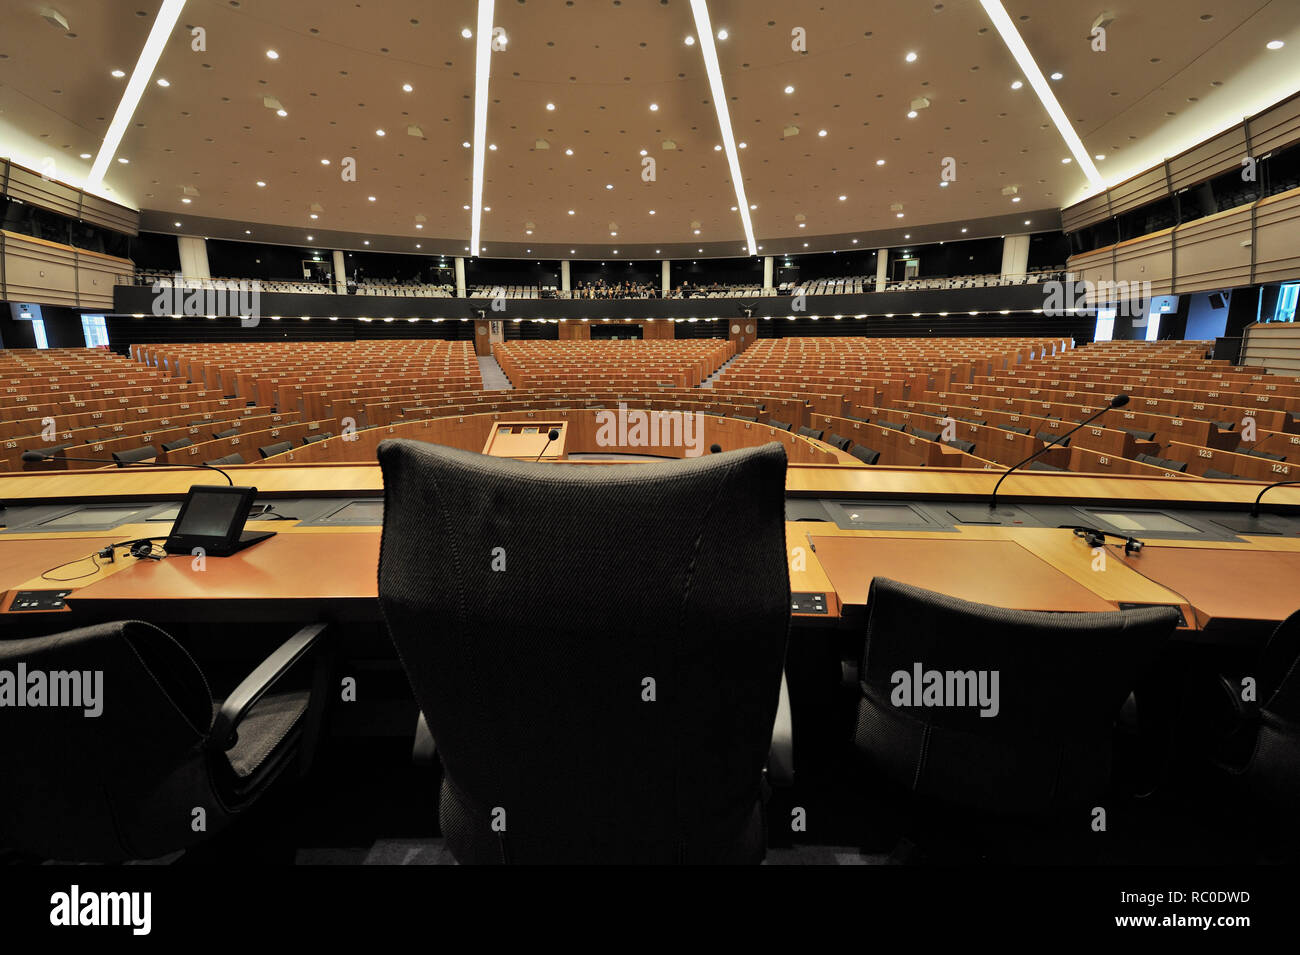 EU-Parlamentsgebäude, Plenarsall des Brüsseler Sitzes des Europäischen Parlaments,  Brüssel, Belgien, Europa   Parliament building of the European Par - Stock Image